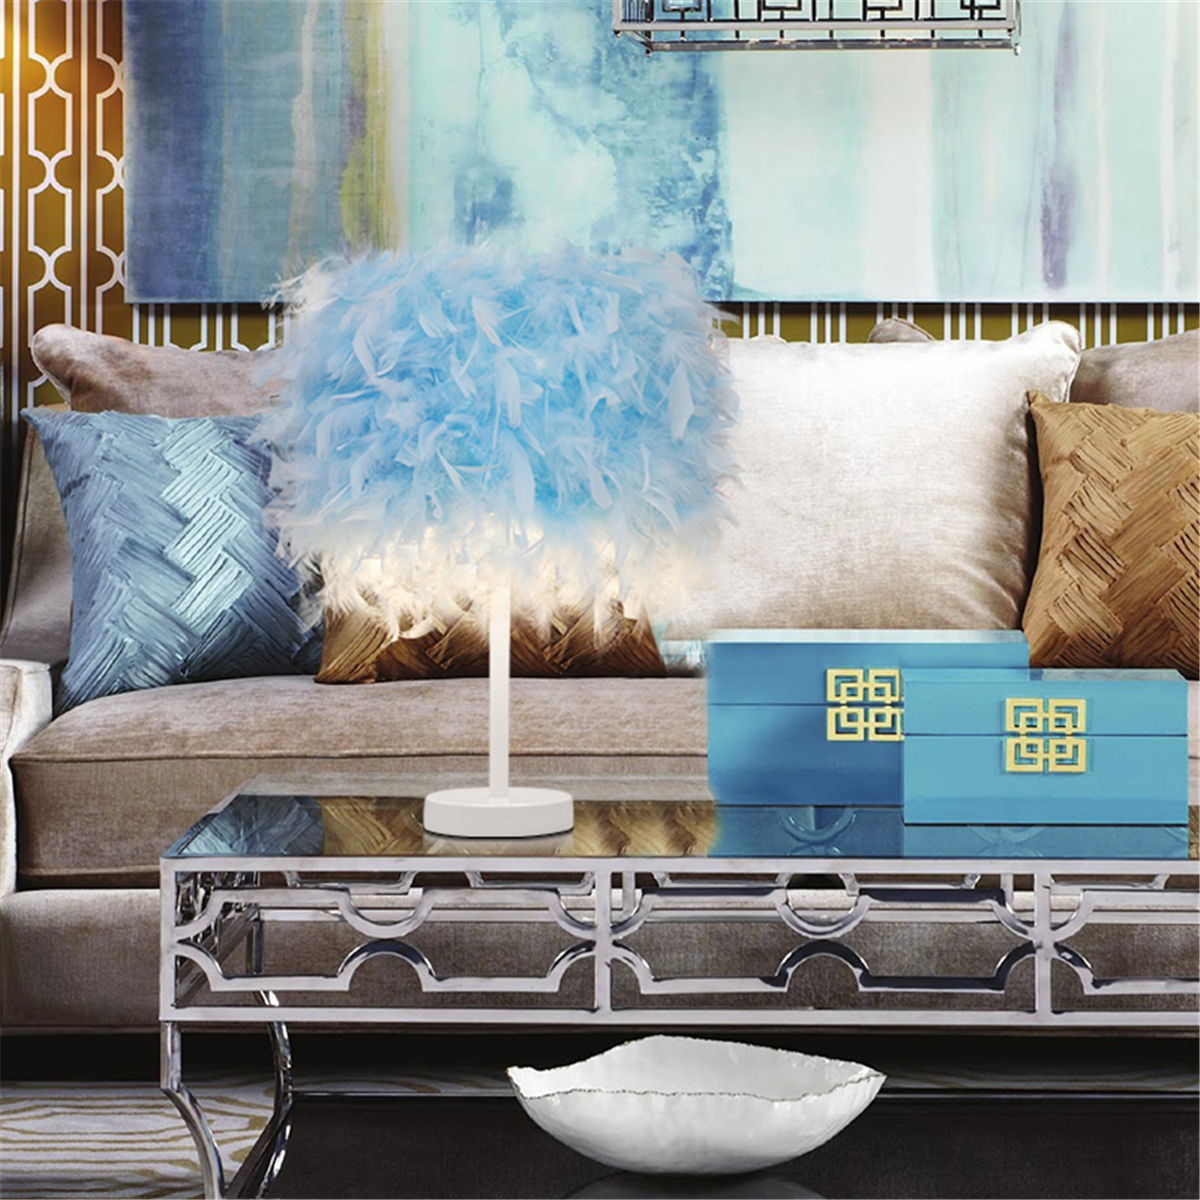 Meigar Feather Lamp Table Desk Night Light Desktop Bedroom Home Decor Gift